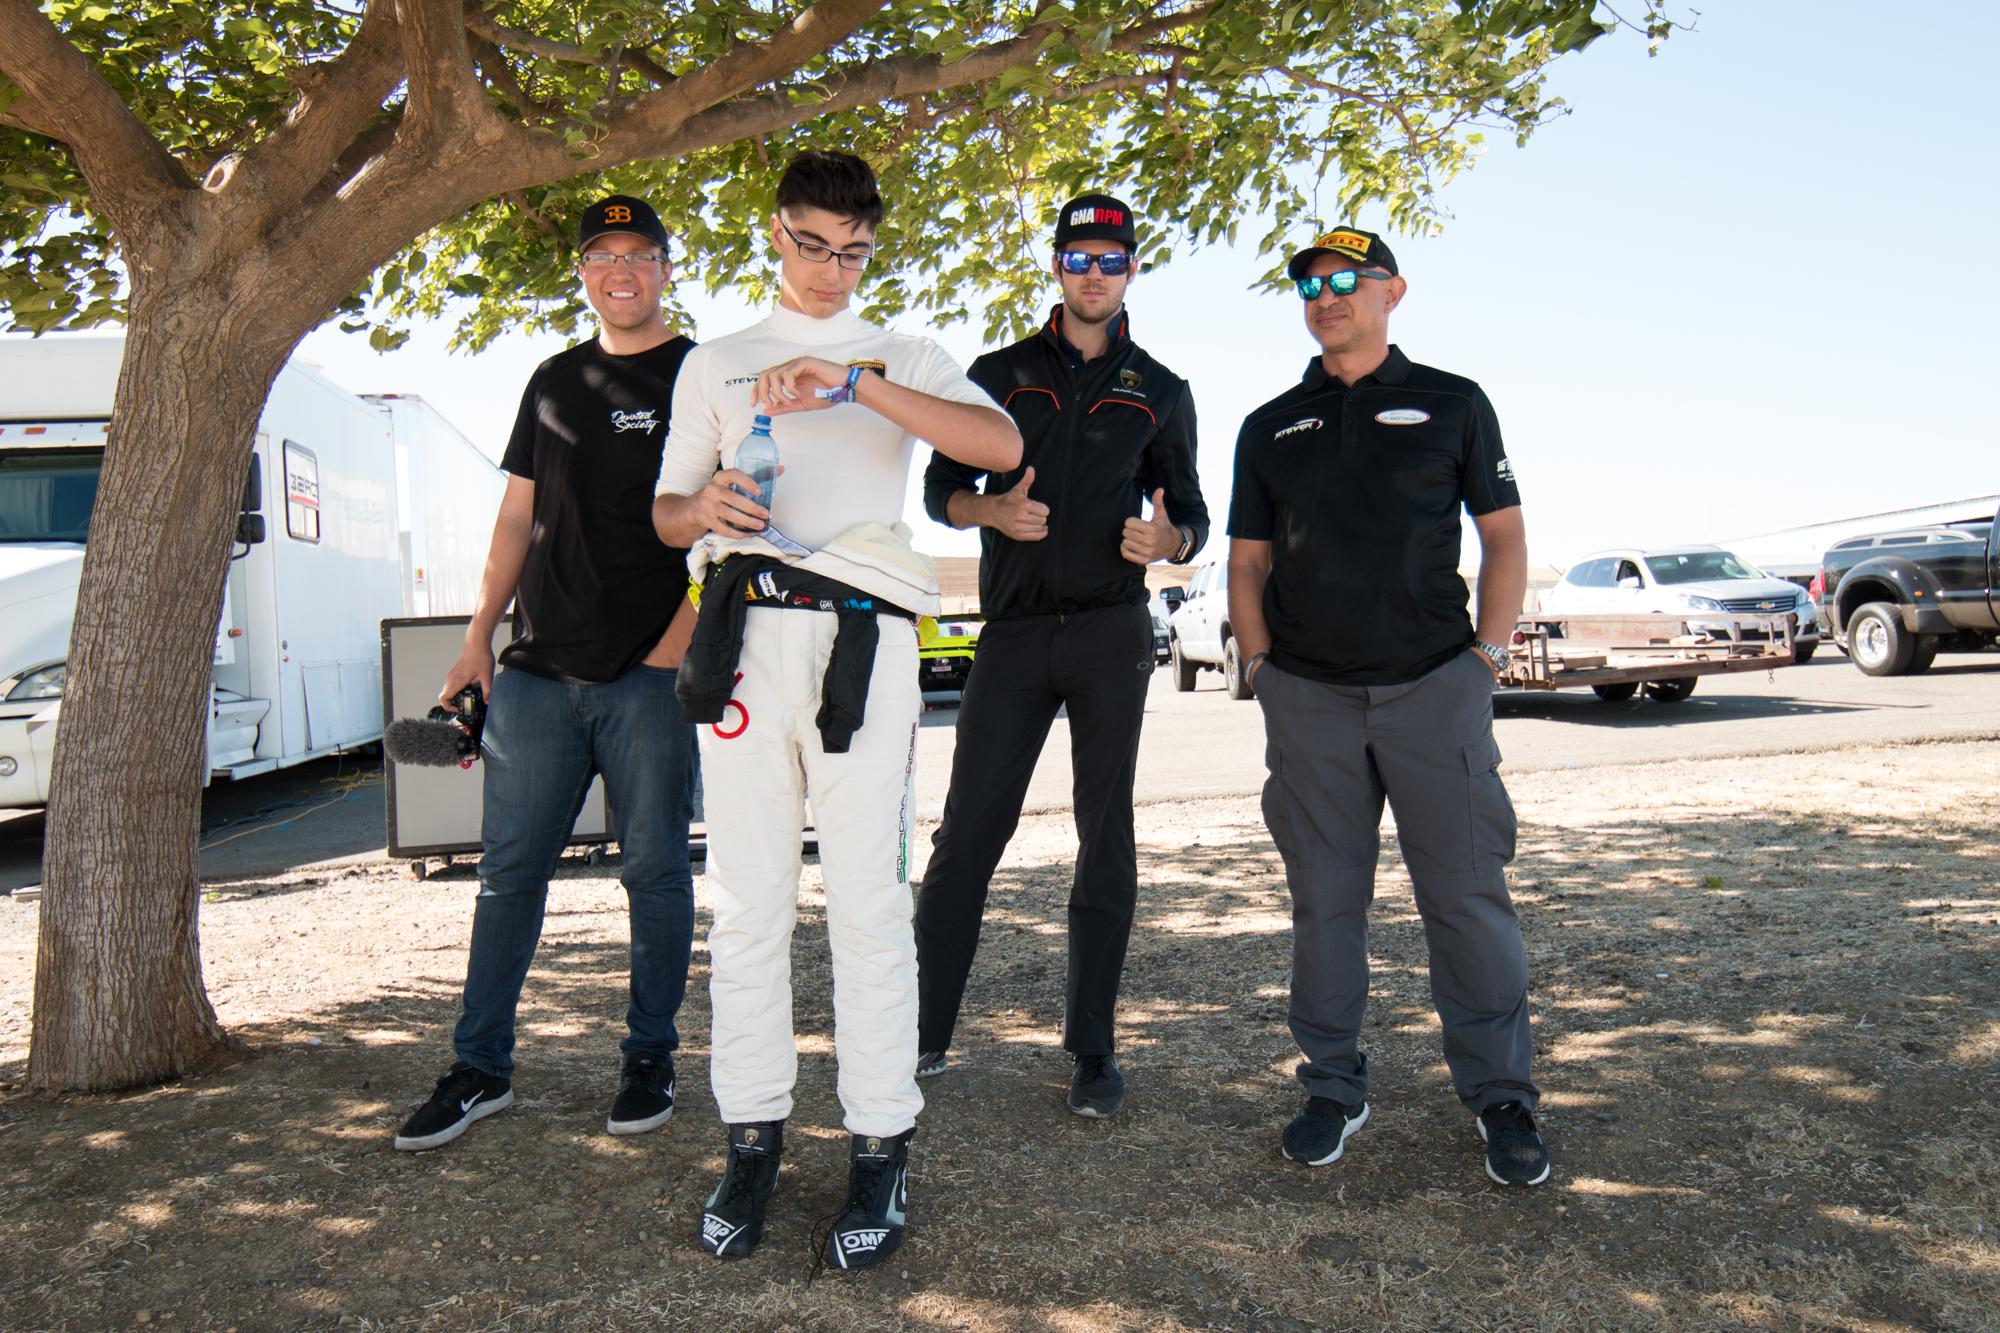 Steven-Racing-20130208-45744.jpg